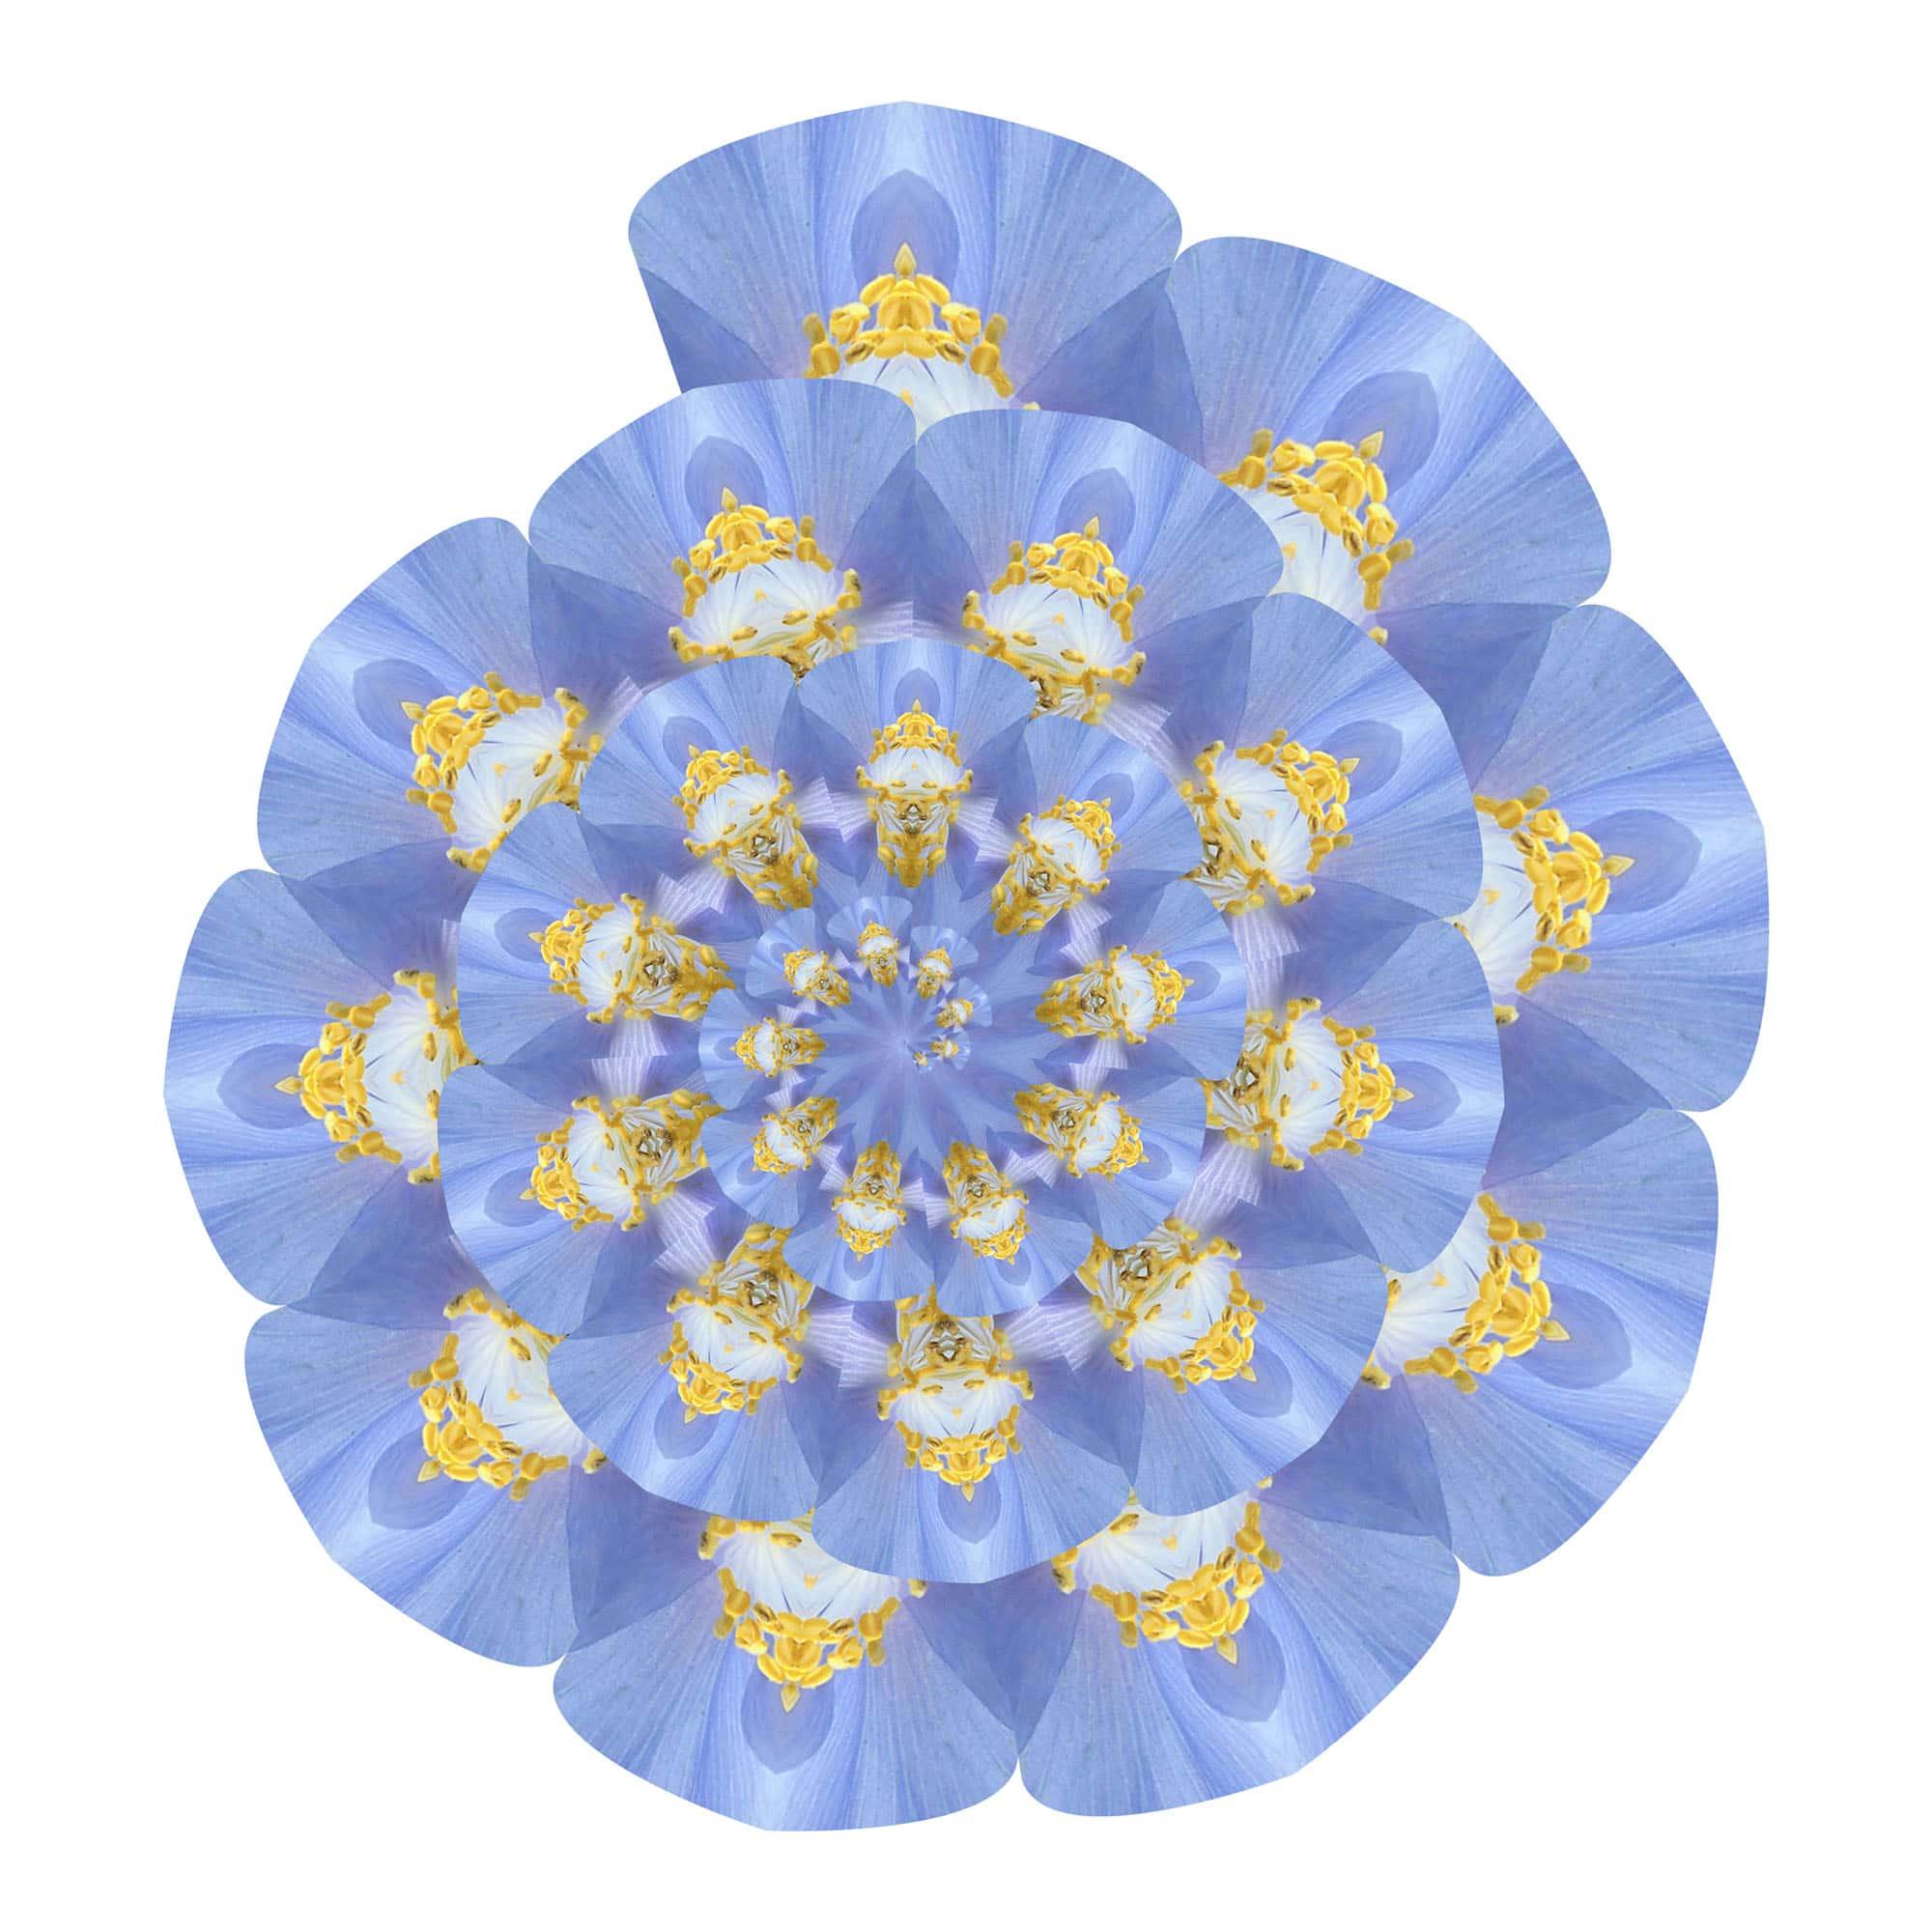 Meconopsis Spirale 01